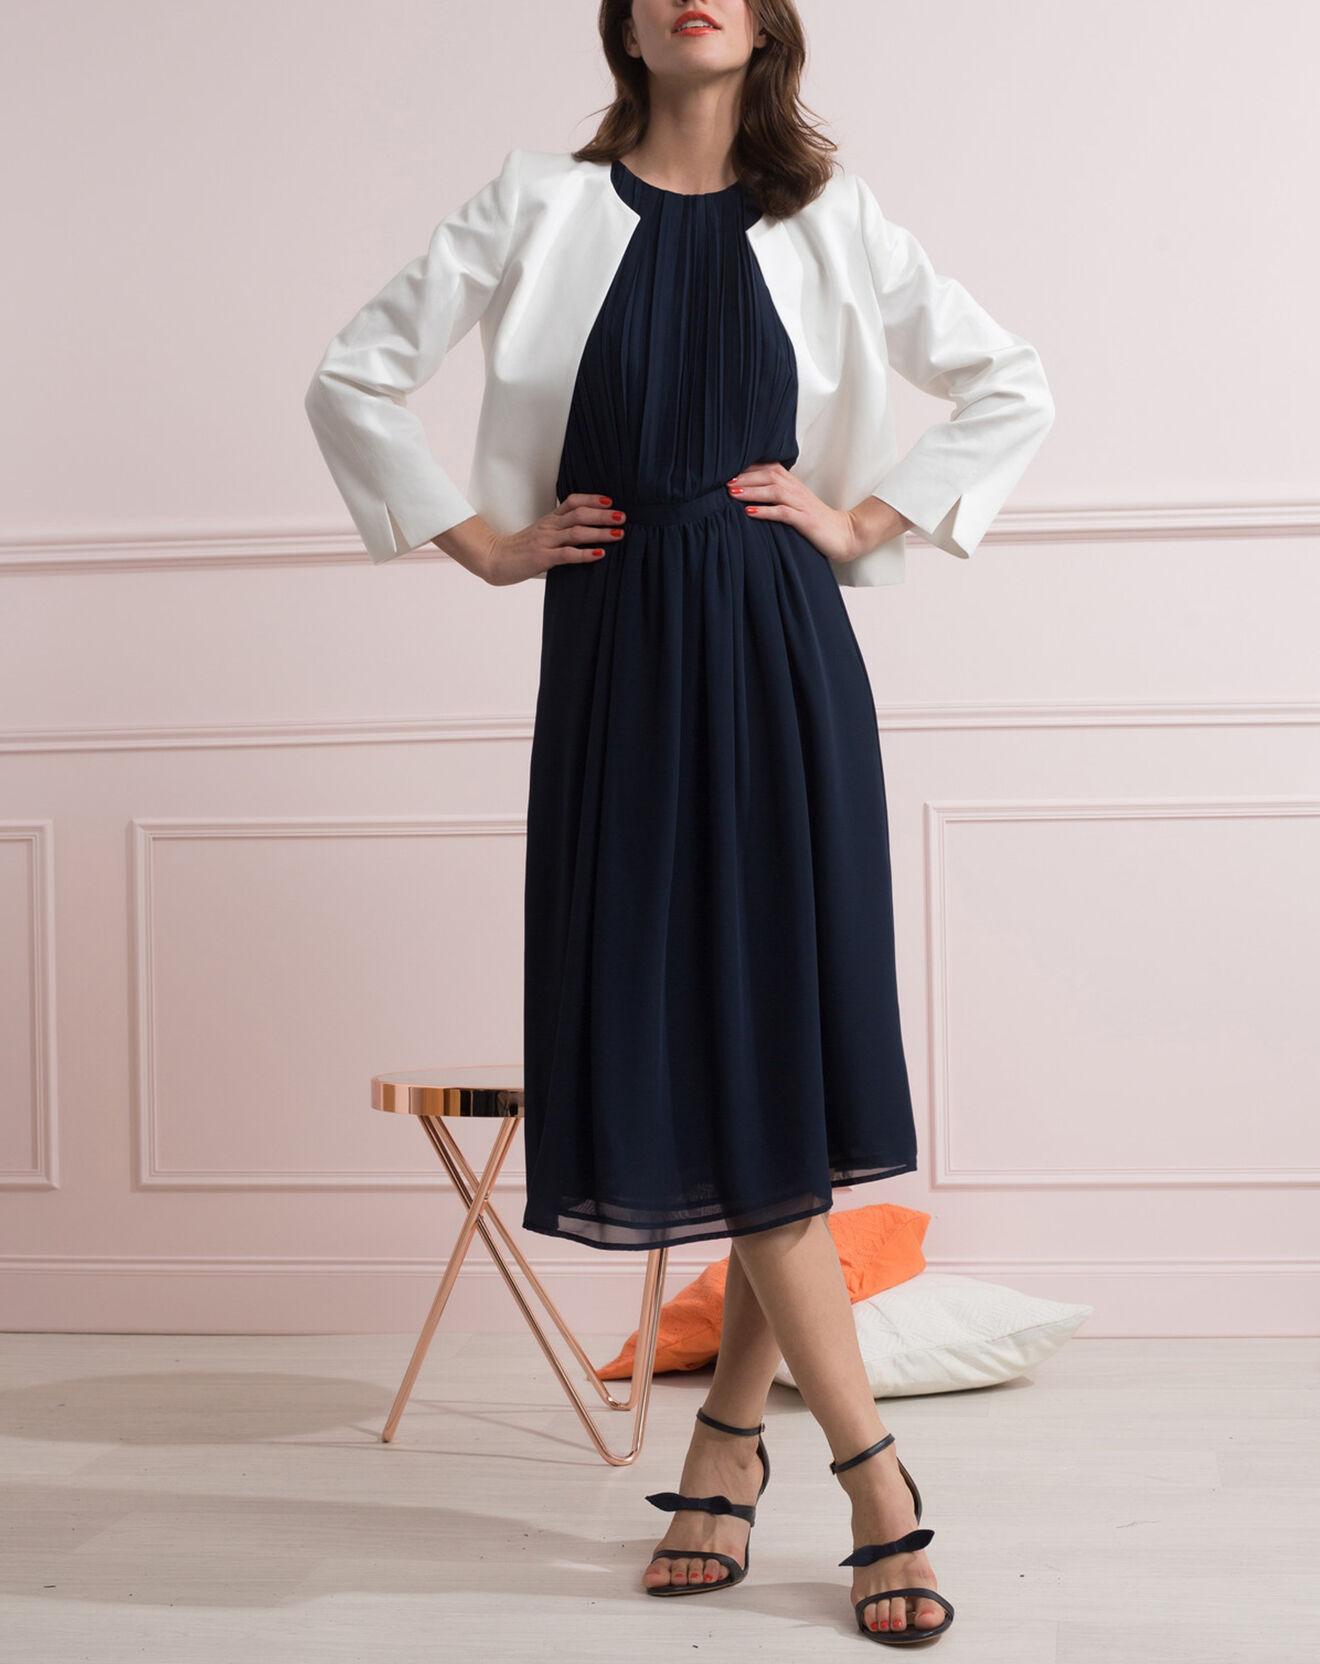 Veste courte Elisa en Coton & Lin ivoire - Caroll - Modalova